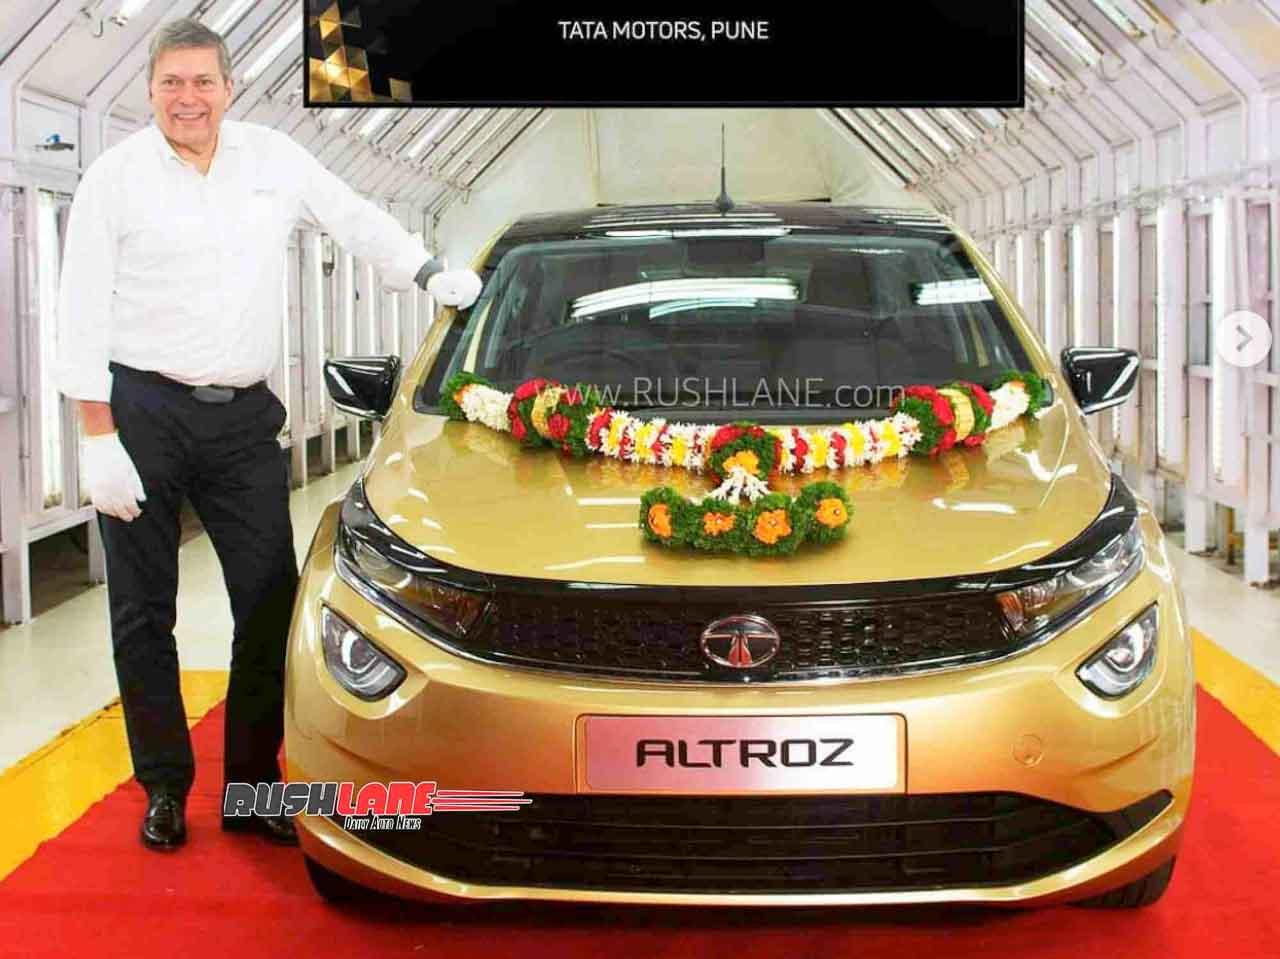 Tata Altroz Production 25000